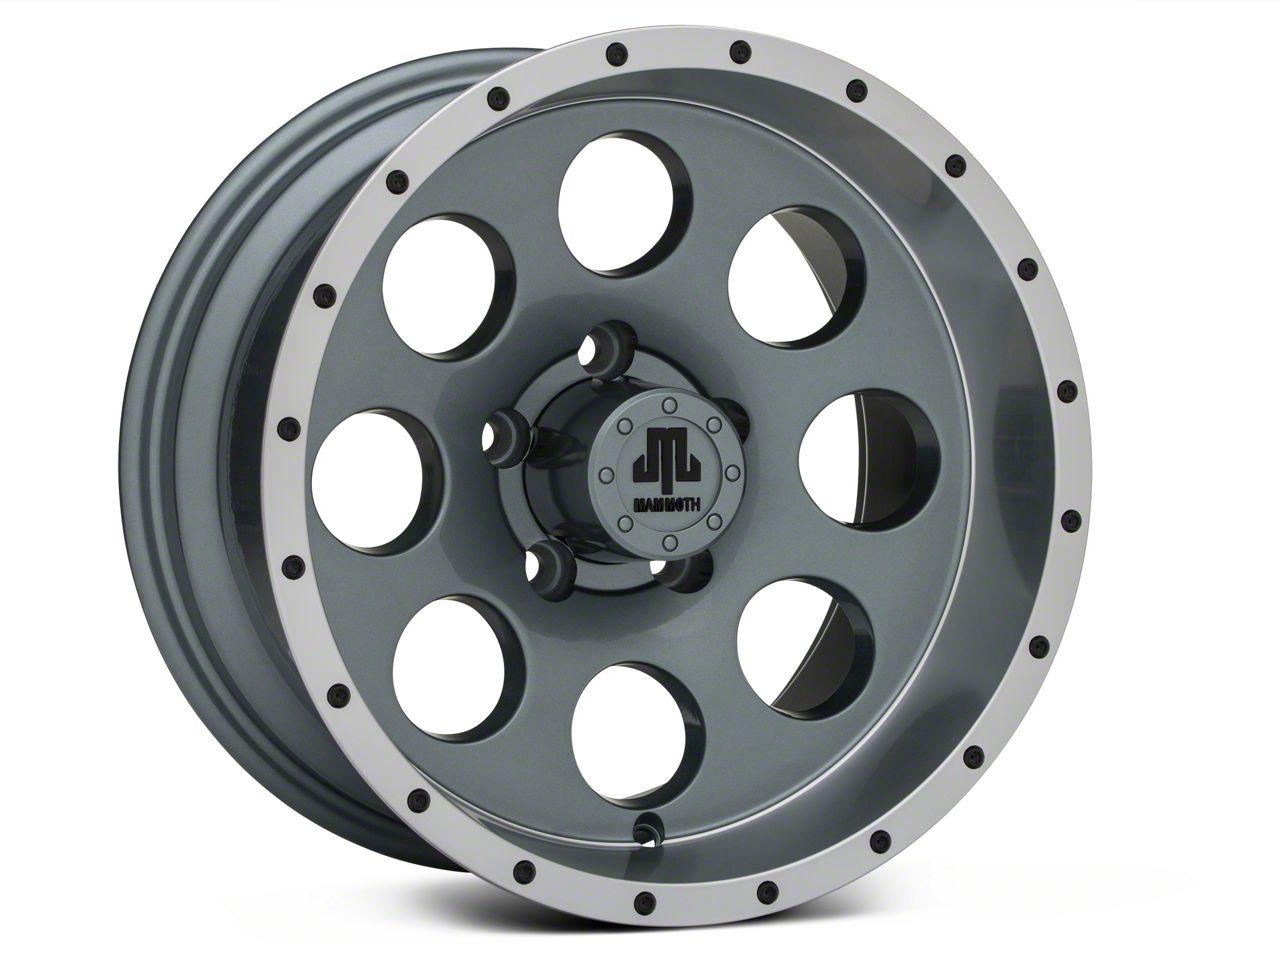 Mammoth 8 Beadlock Style Anthracite 15x8 Wheel & Mickey Thompson Deegan 38 31x10.50R15 Tire Kit (87-06 Jeep Wrangler YJ & TJ)